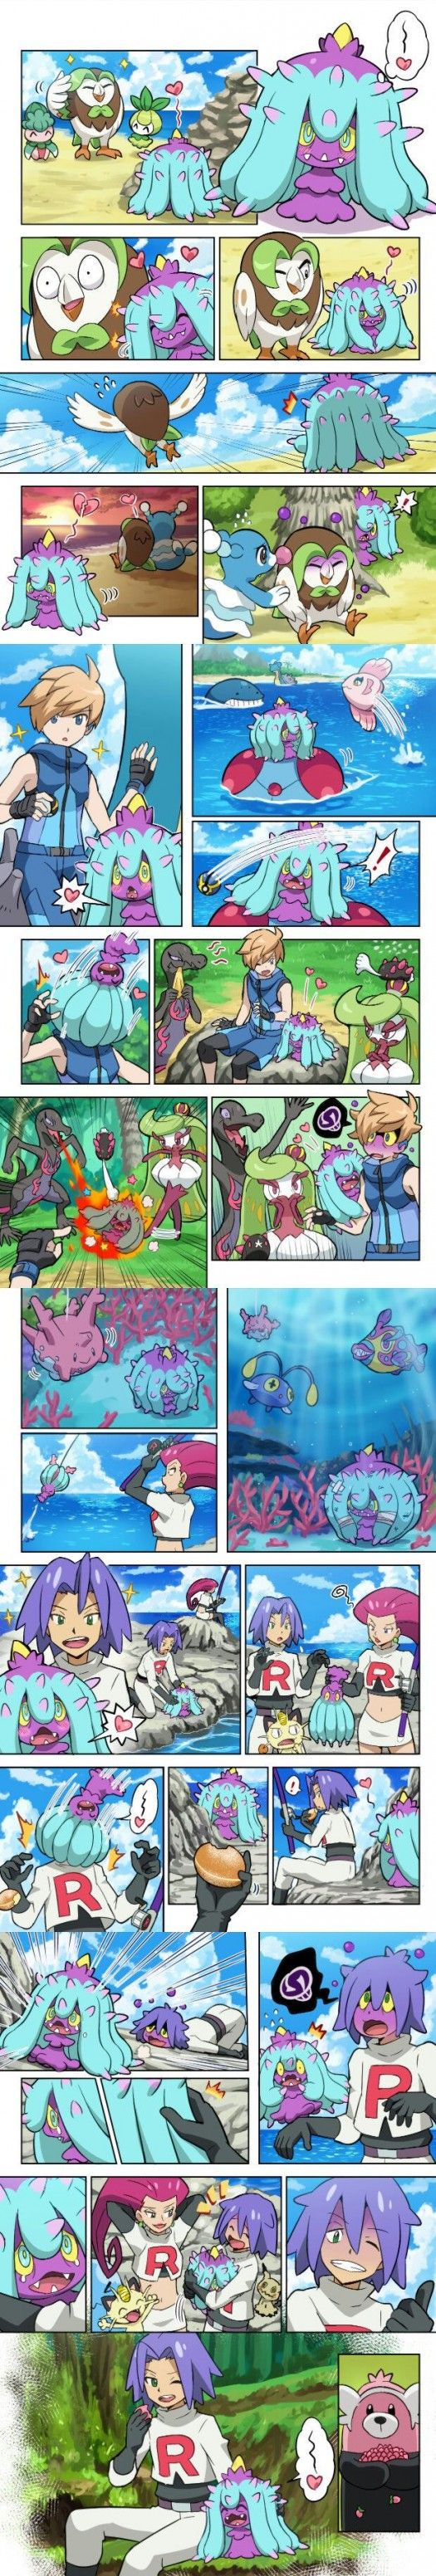 El nuevo pokemon de James